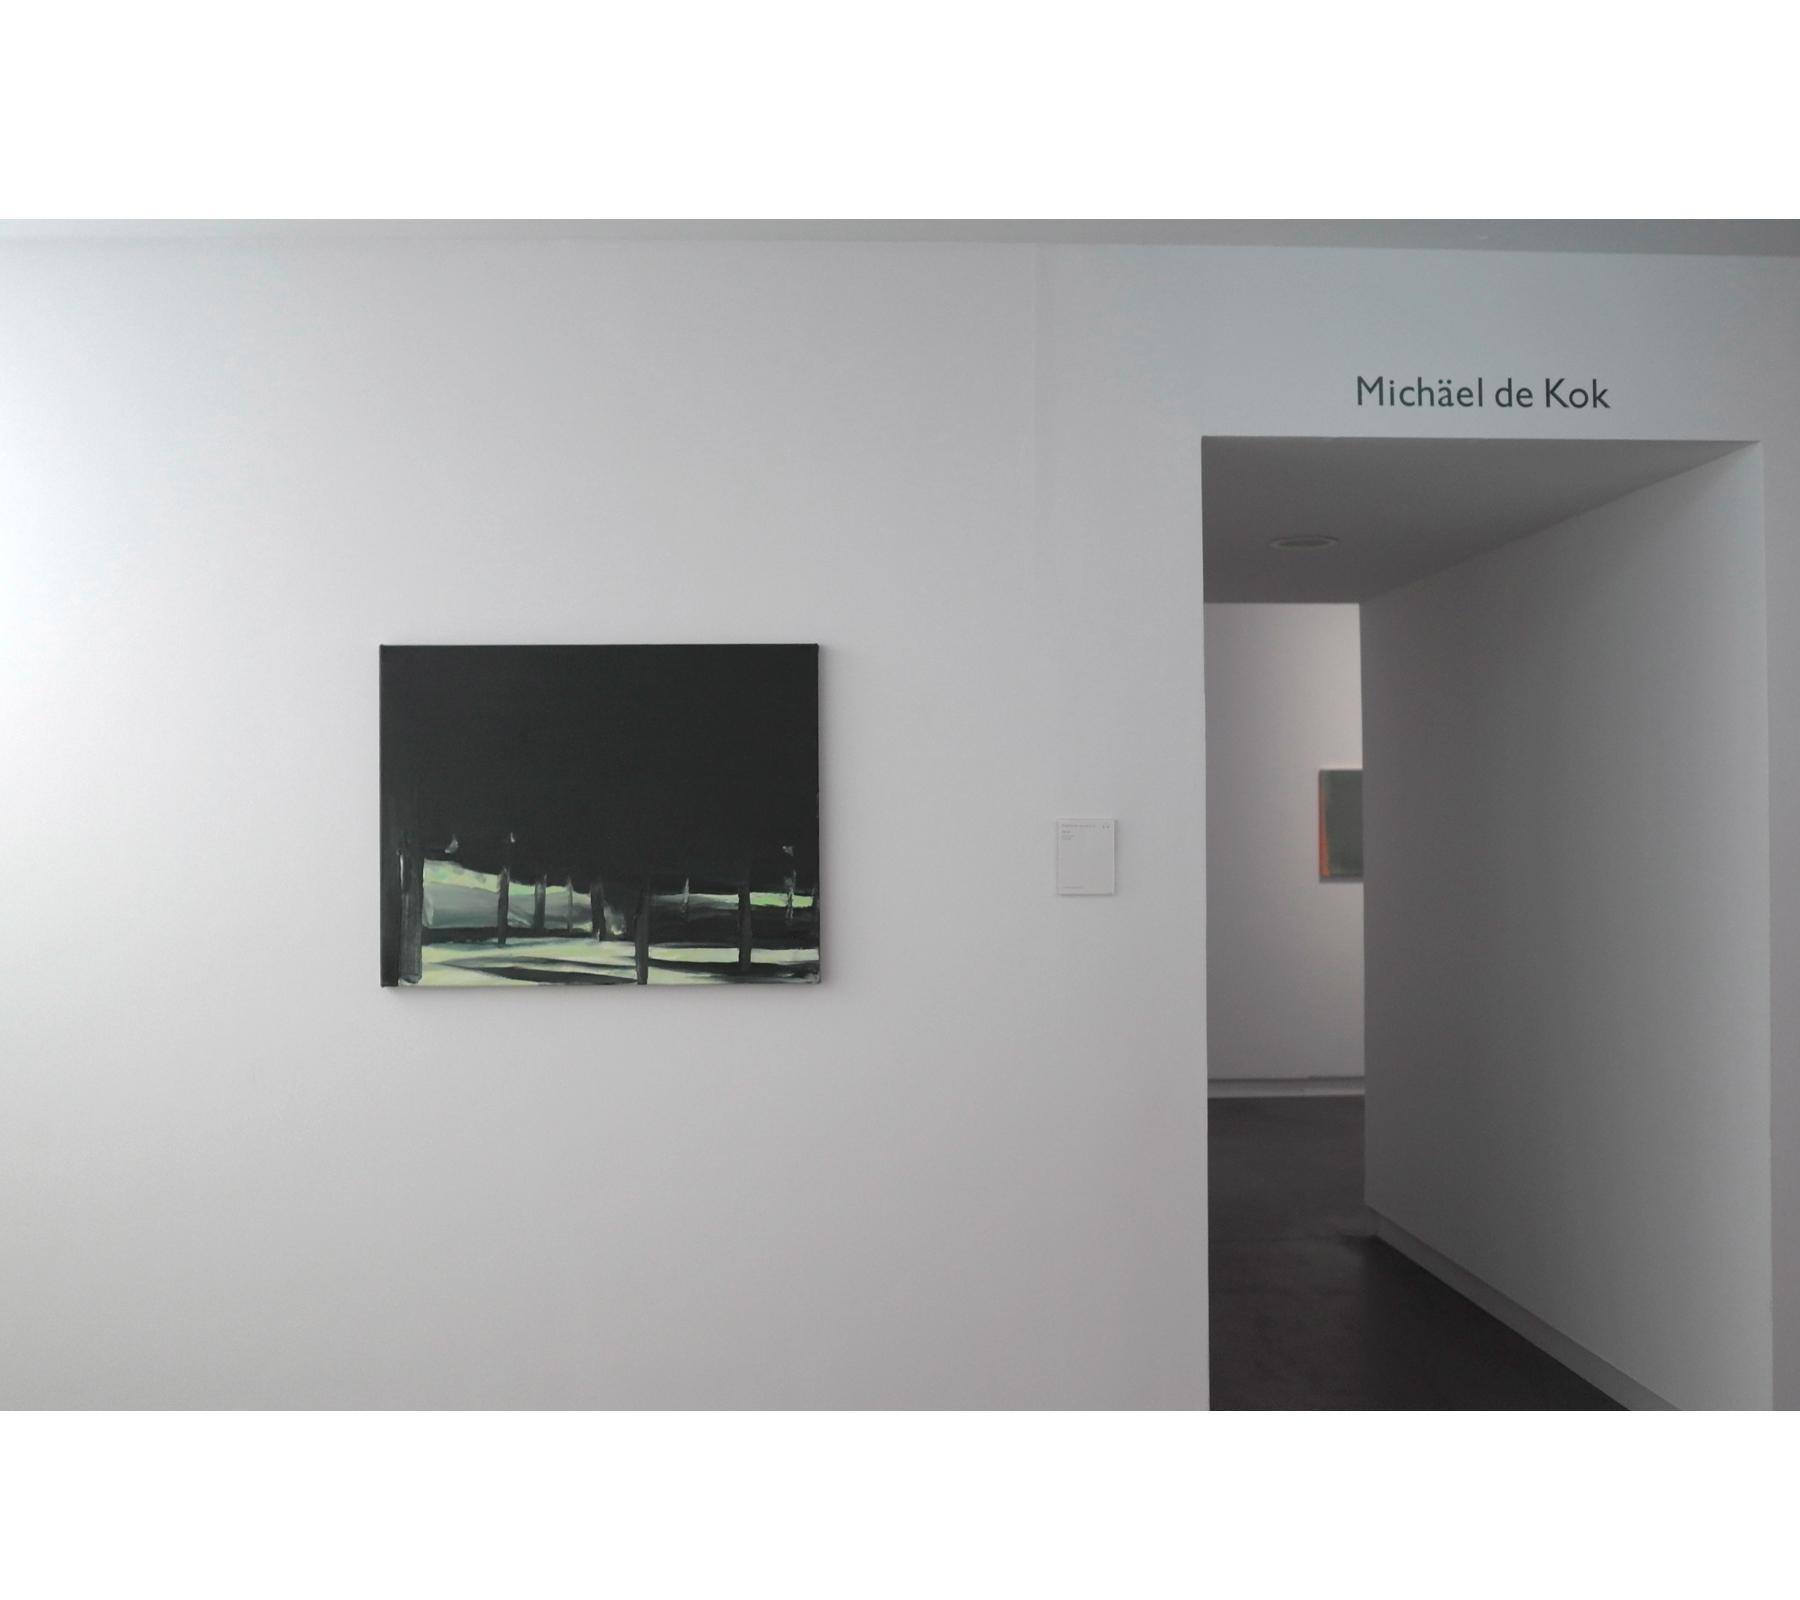 Museum de Pont 2018/2019